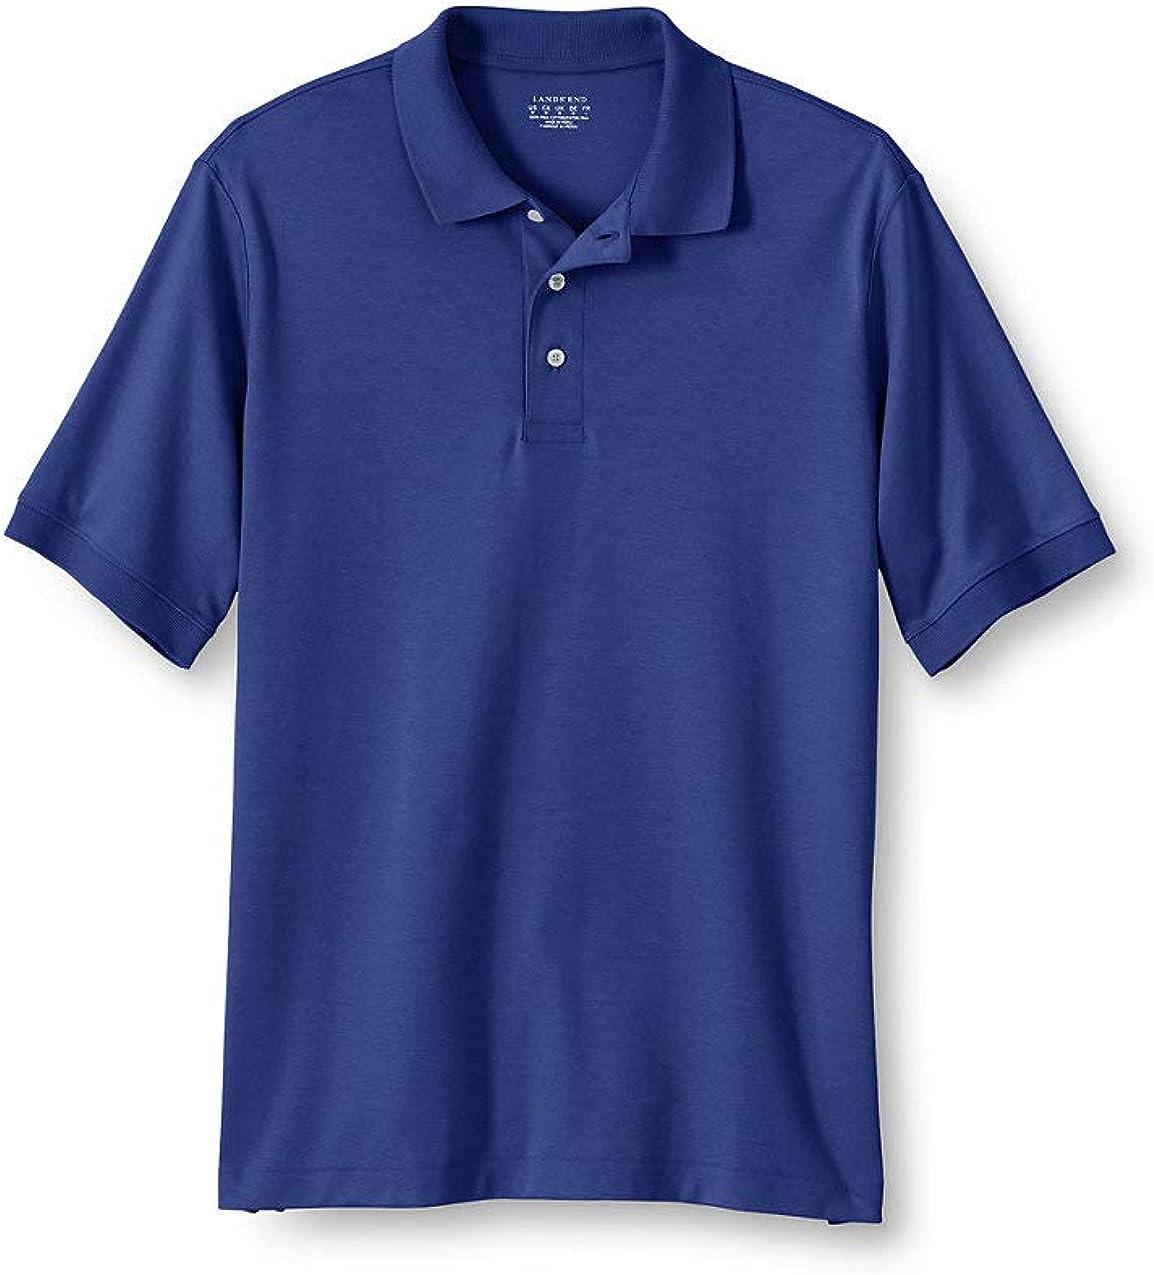 Lands' End School Uniform Men's Banded Short Sleeve Pima Polo